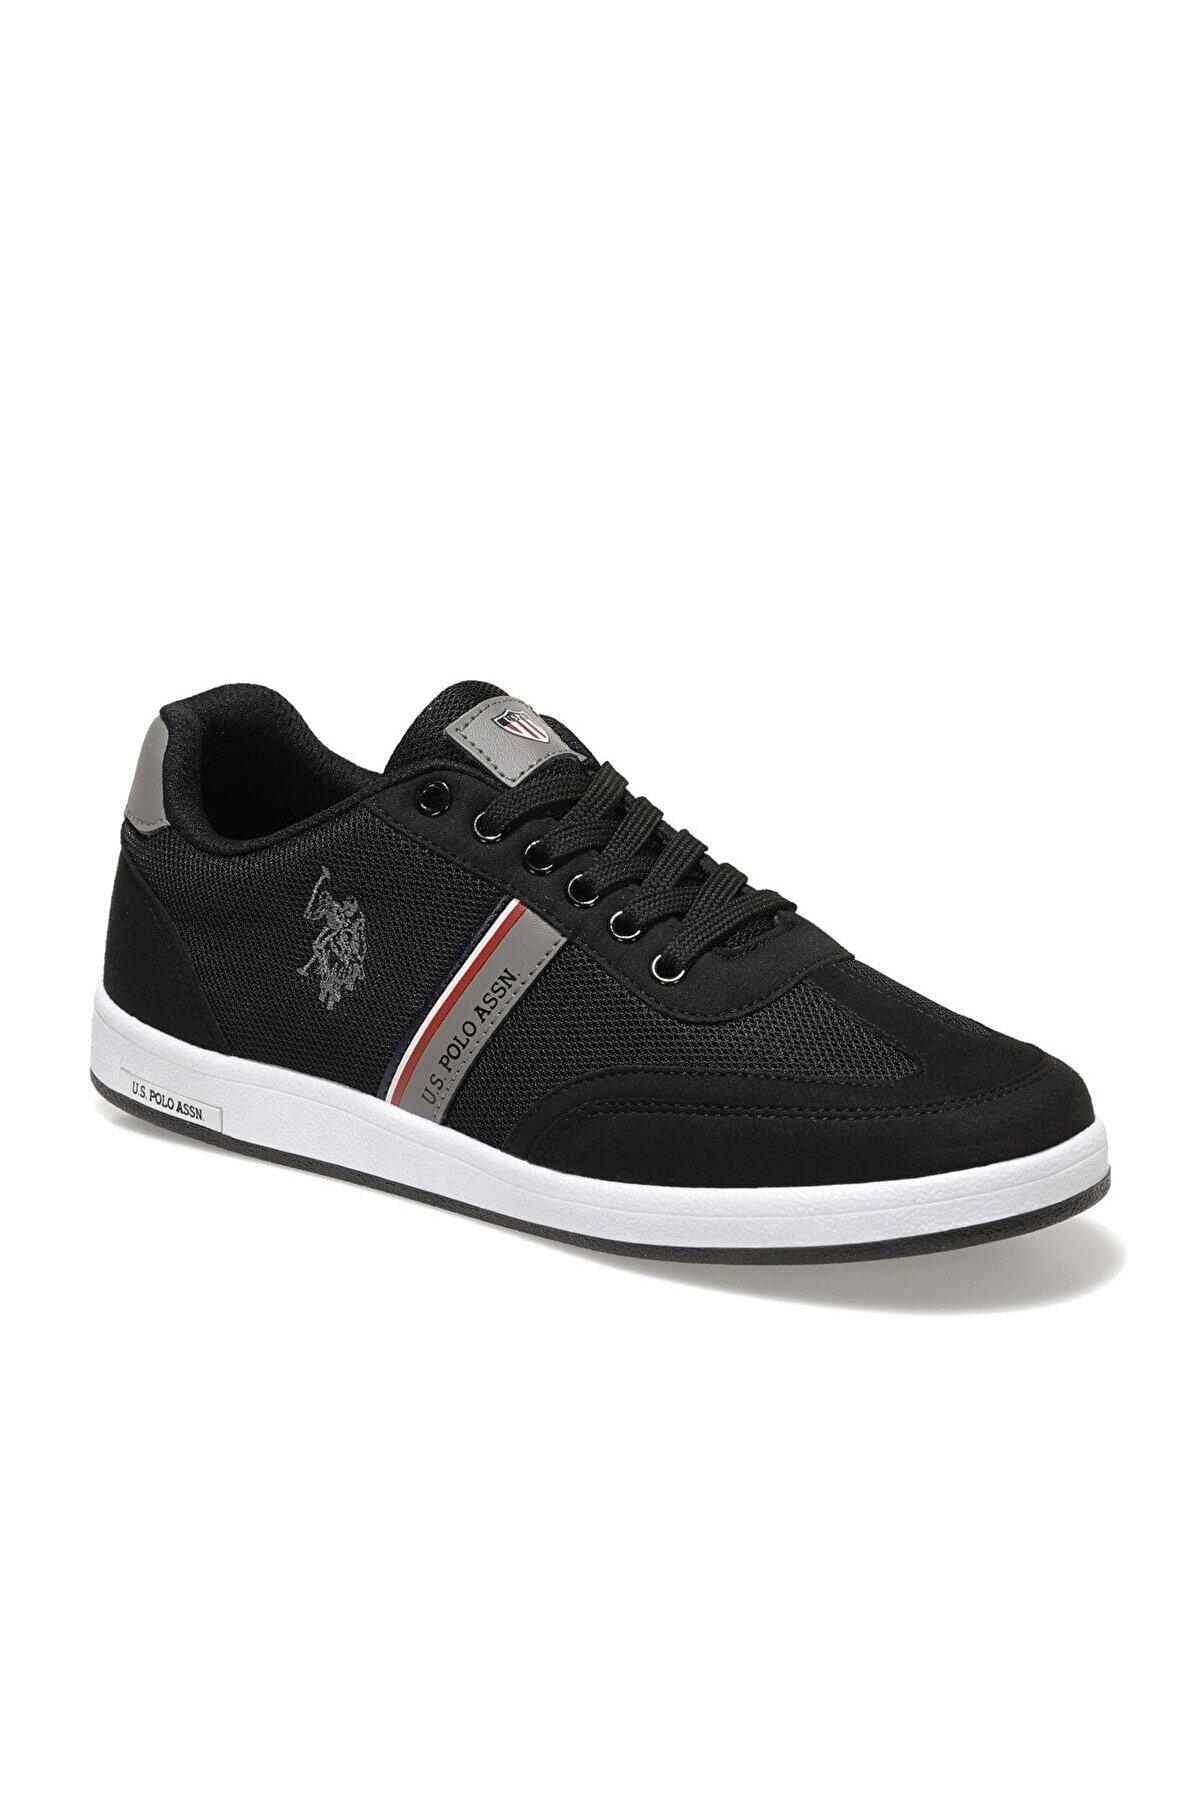 US Polo Assn KARES 1FX Siyah Erkek Sneaker Ayakkabı 100910454